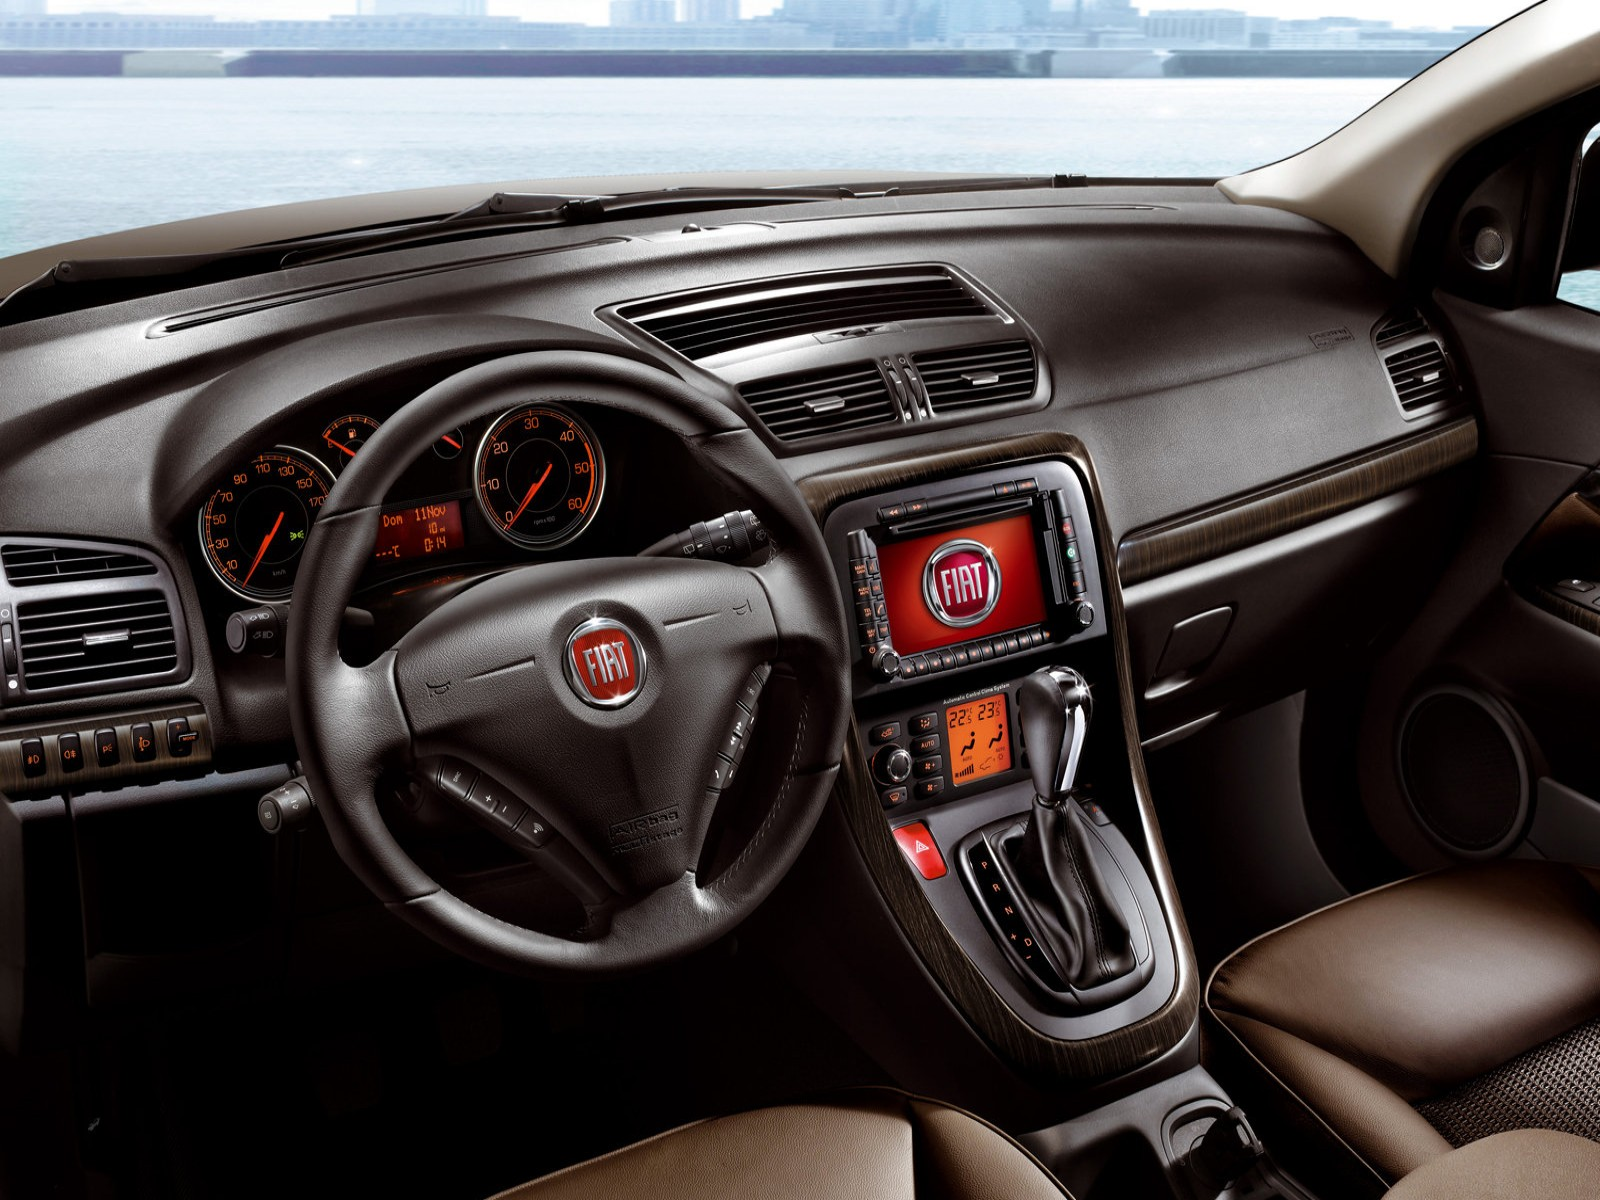 Fiat Croma 1600